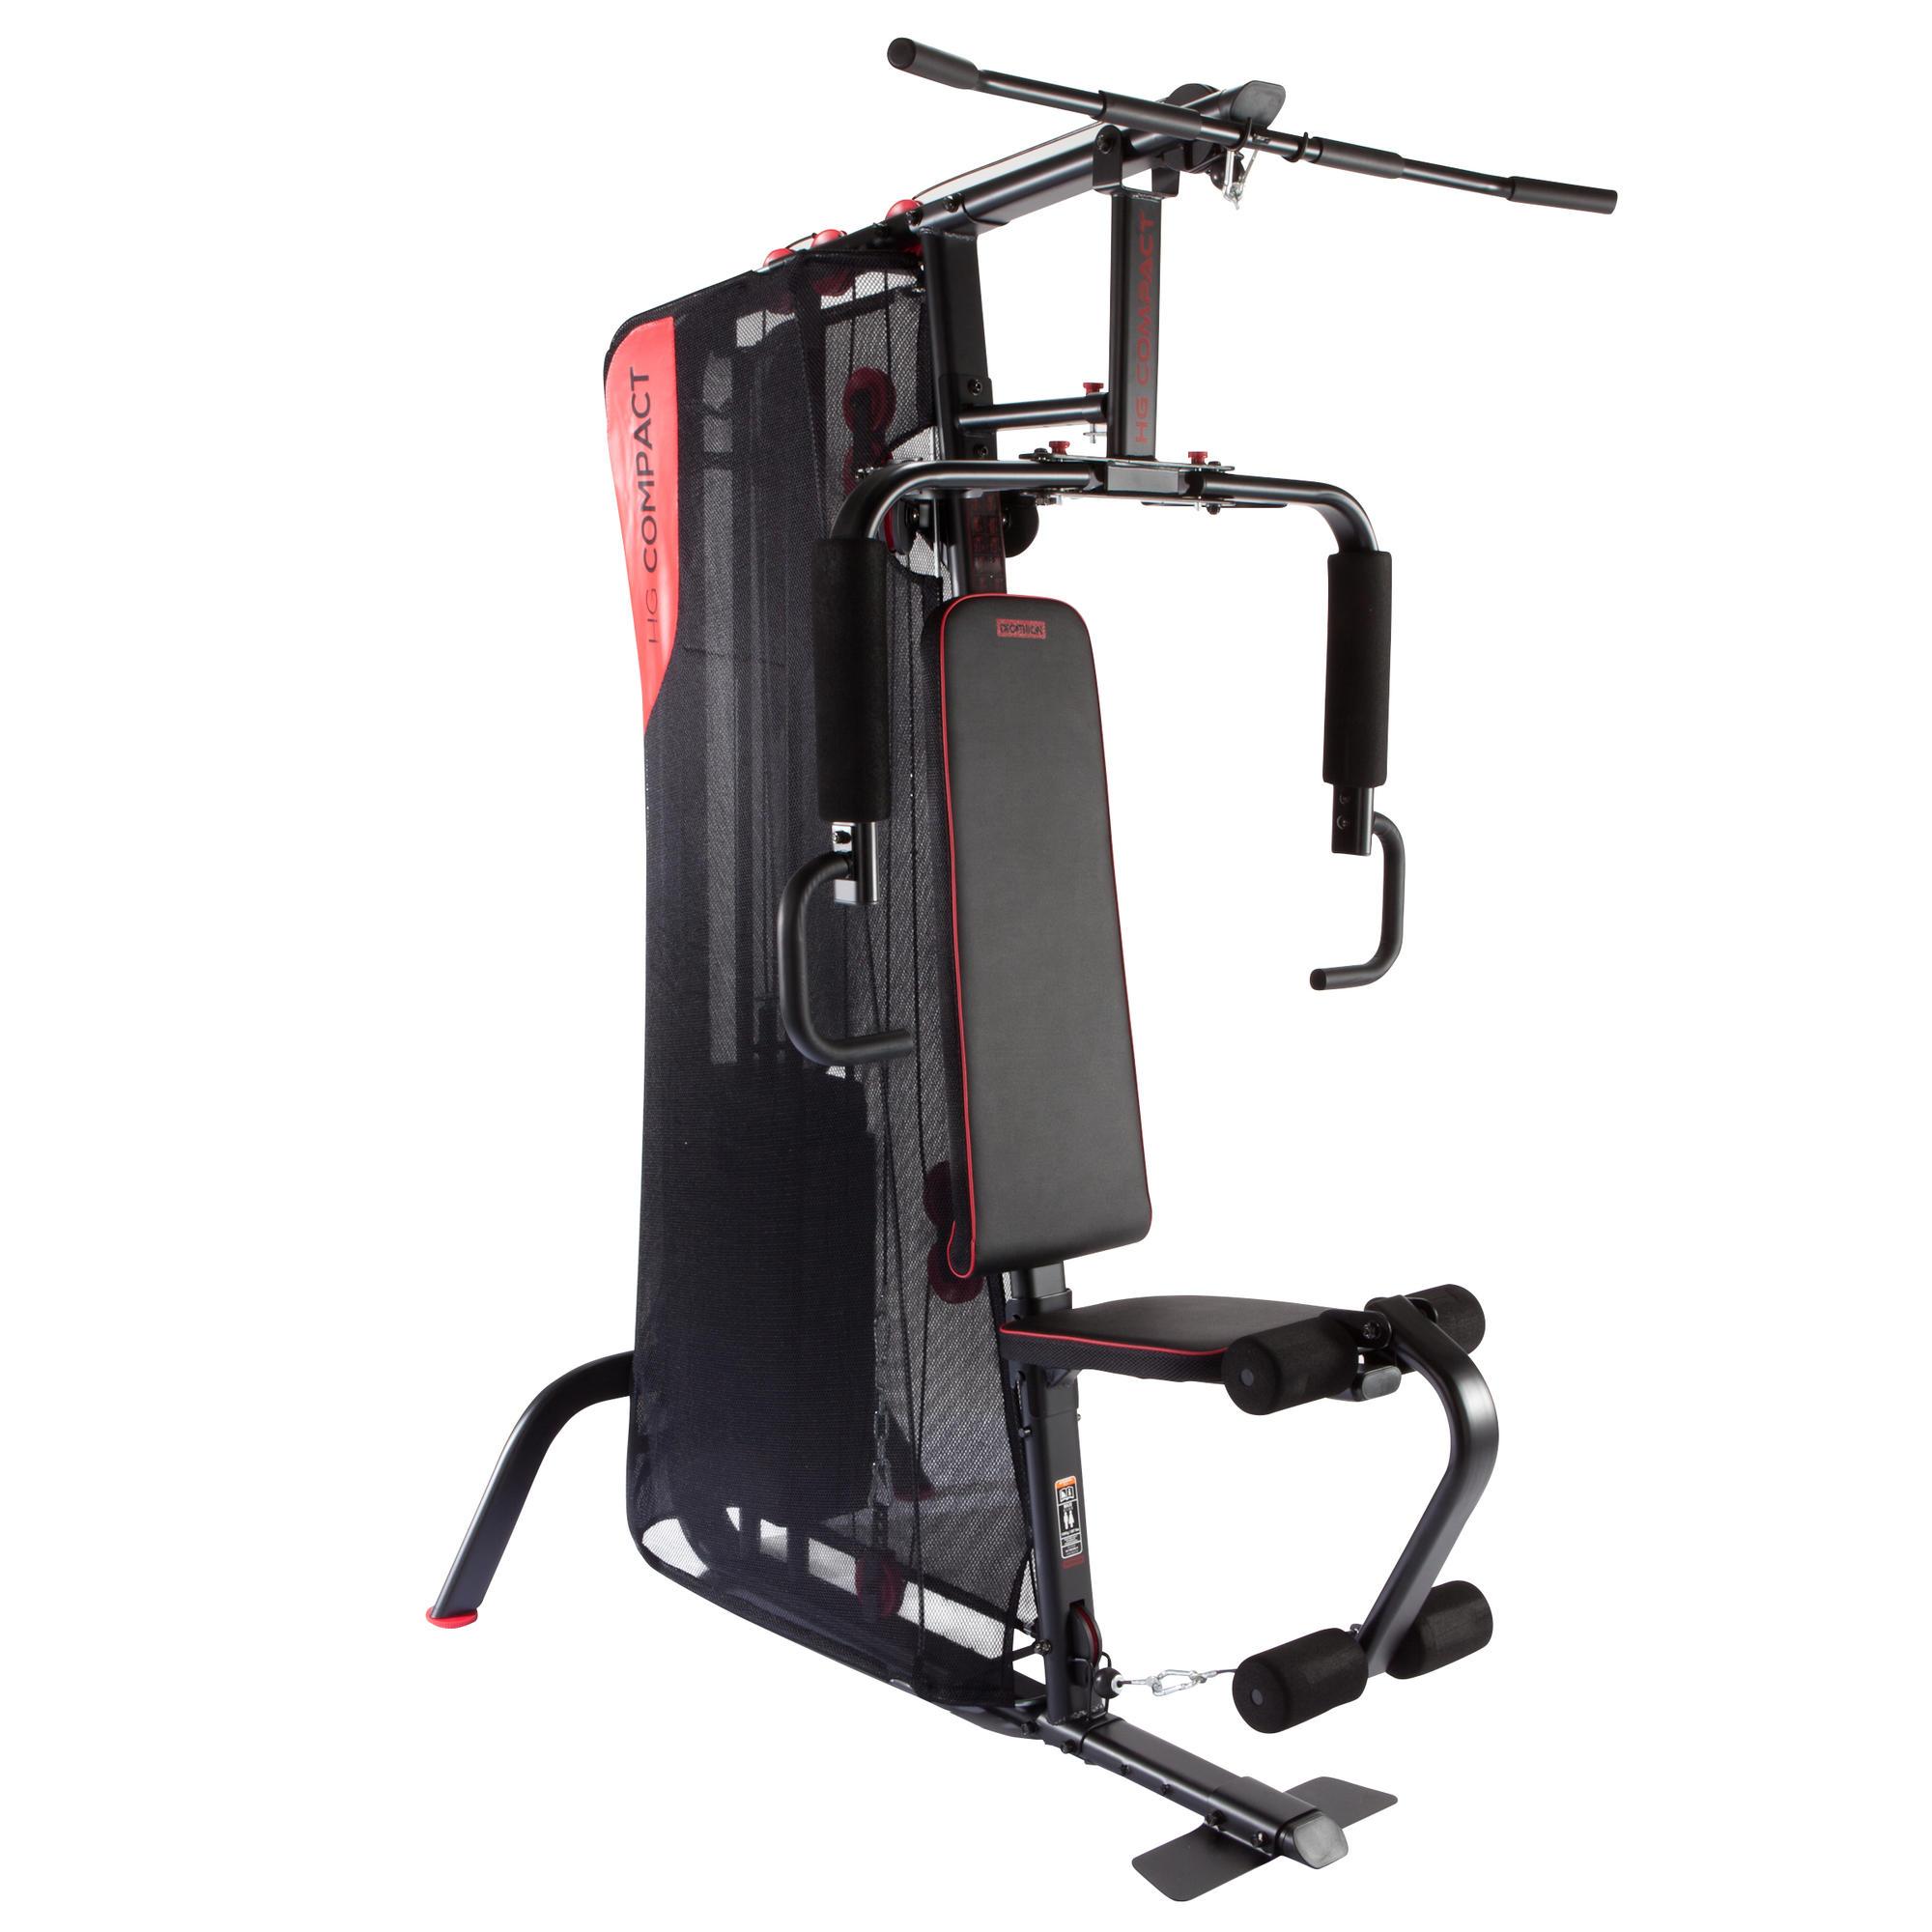 Appareil de musculation charge guid e decathlon - Banc de musculation charge guidee ...